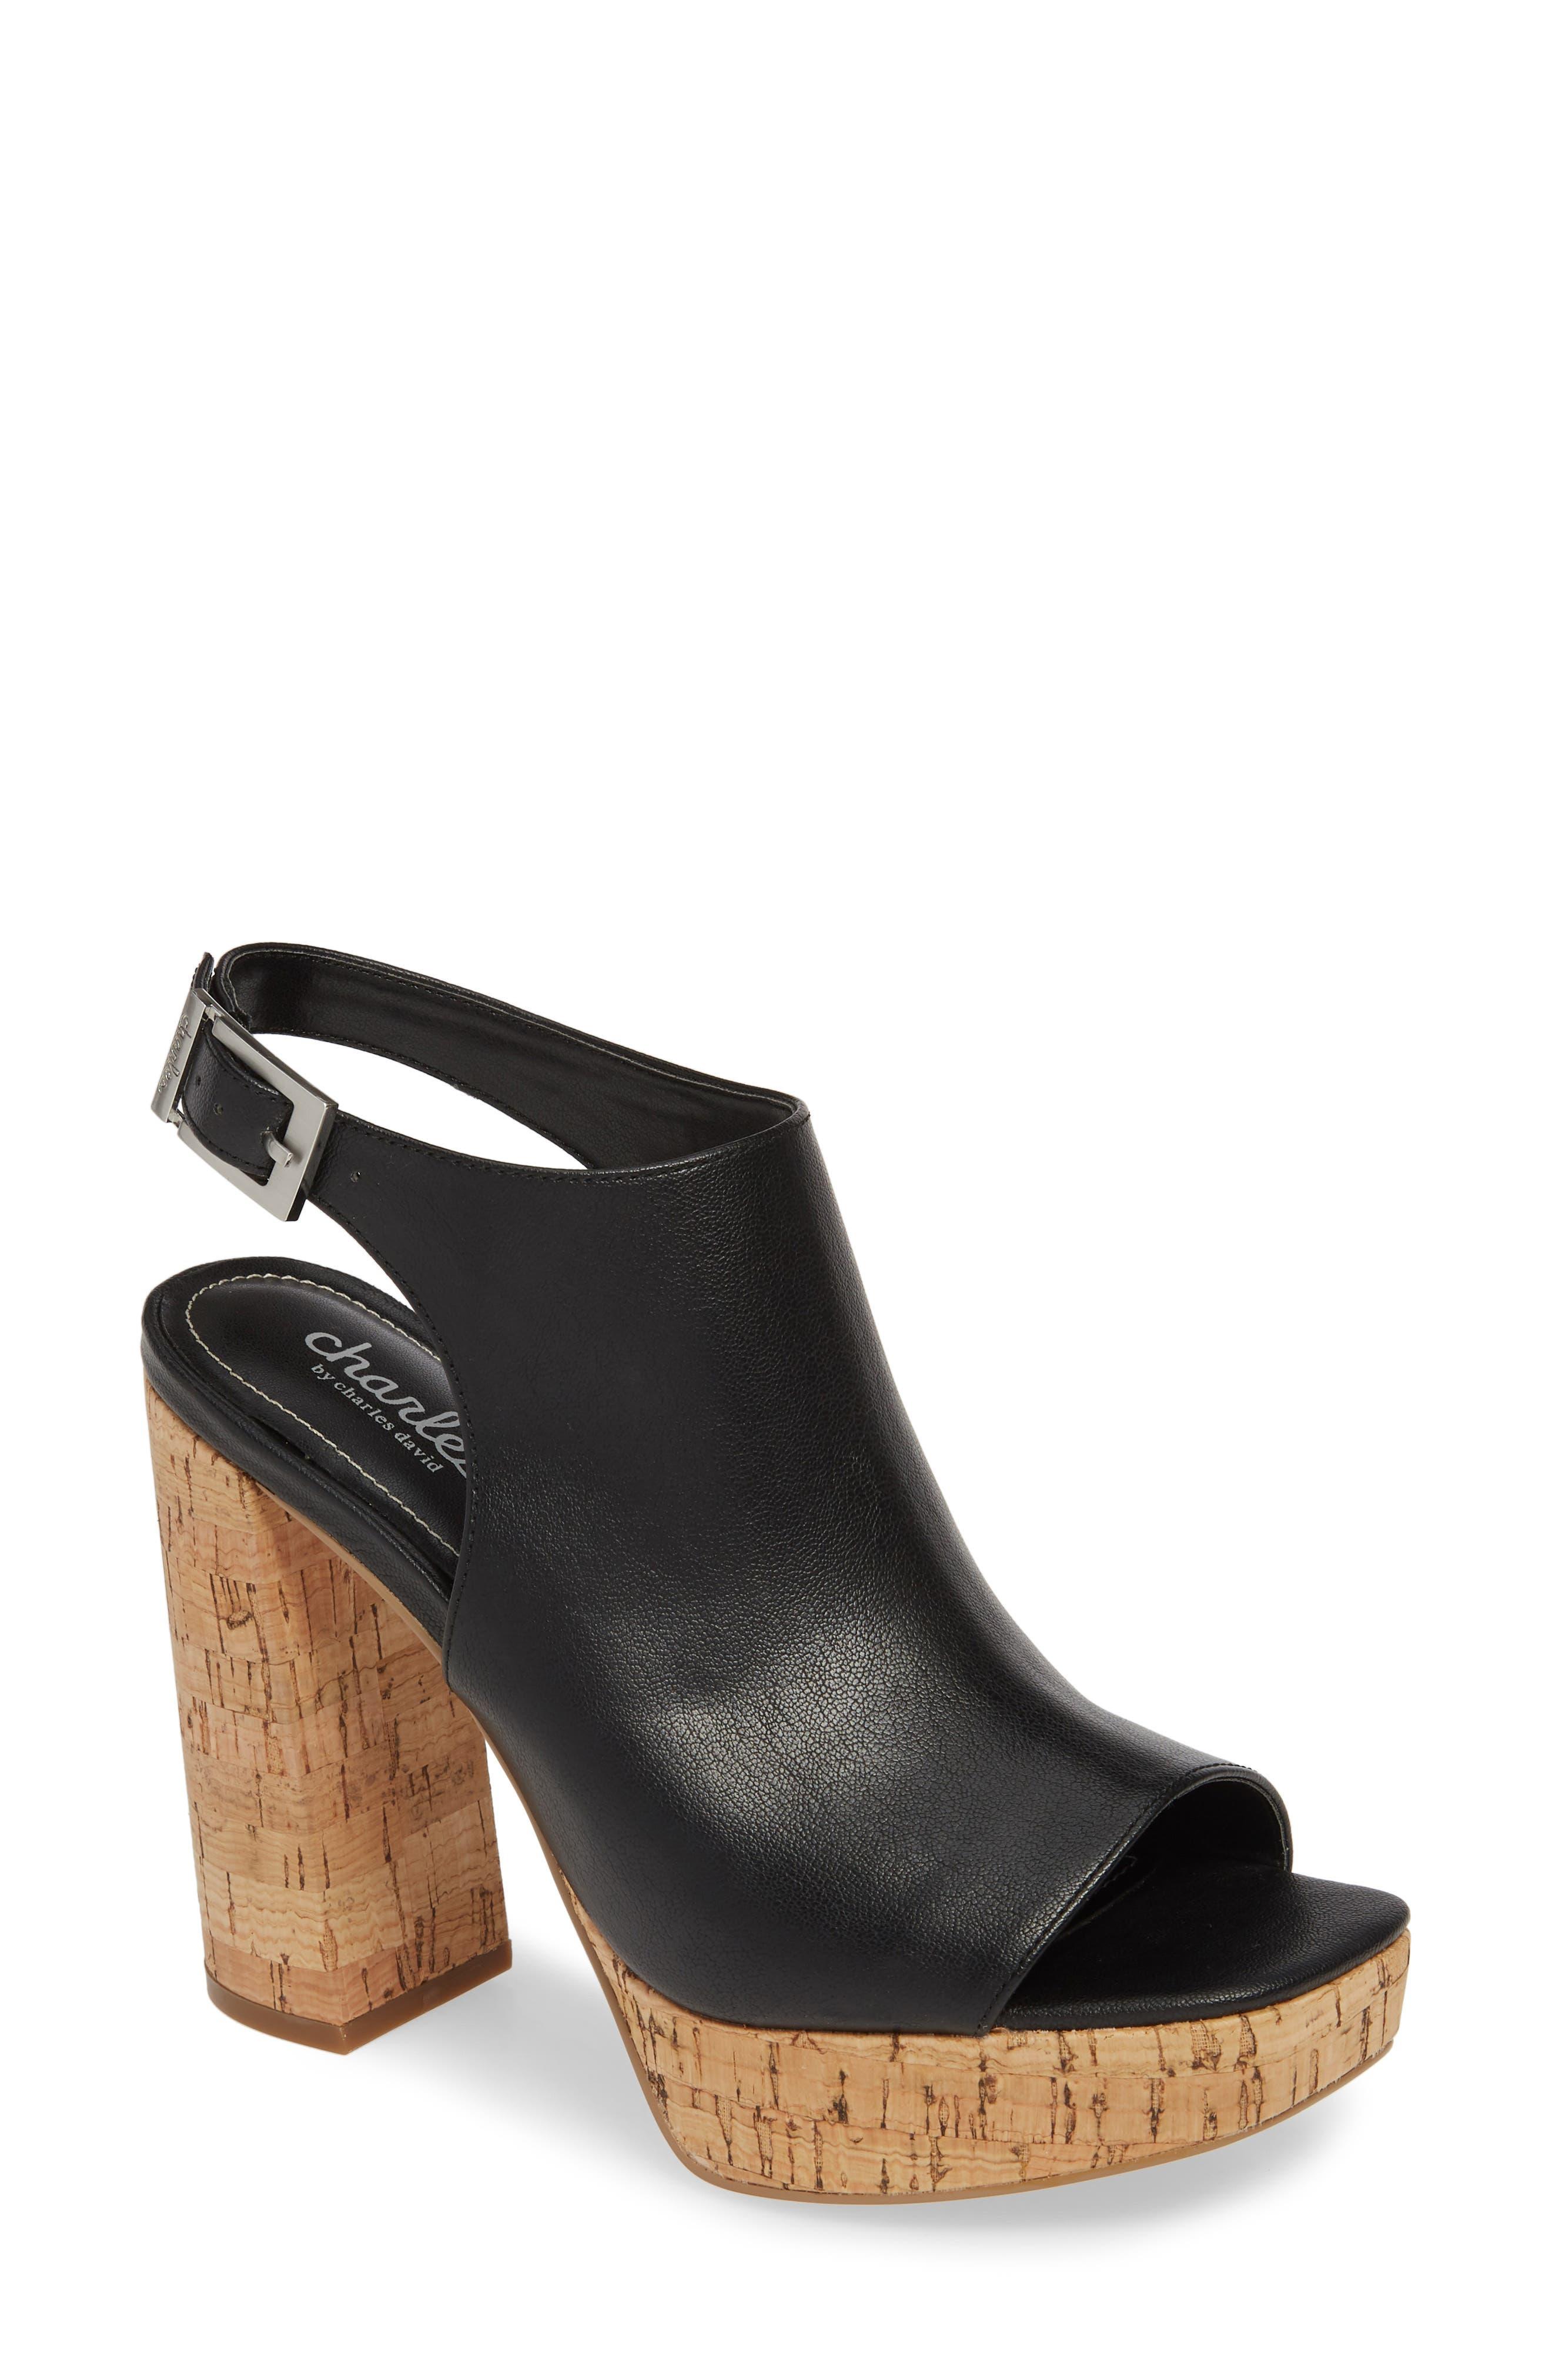 Charles By Charles David Imani Platform Sandal, Black